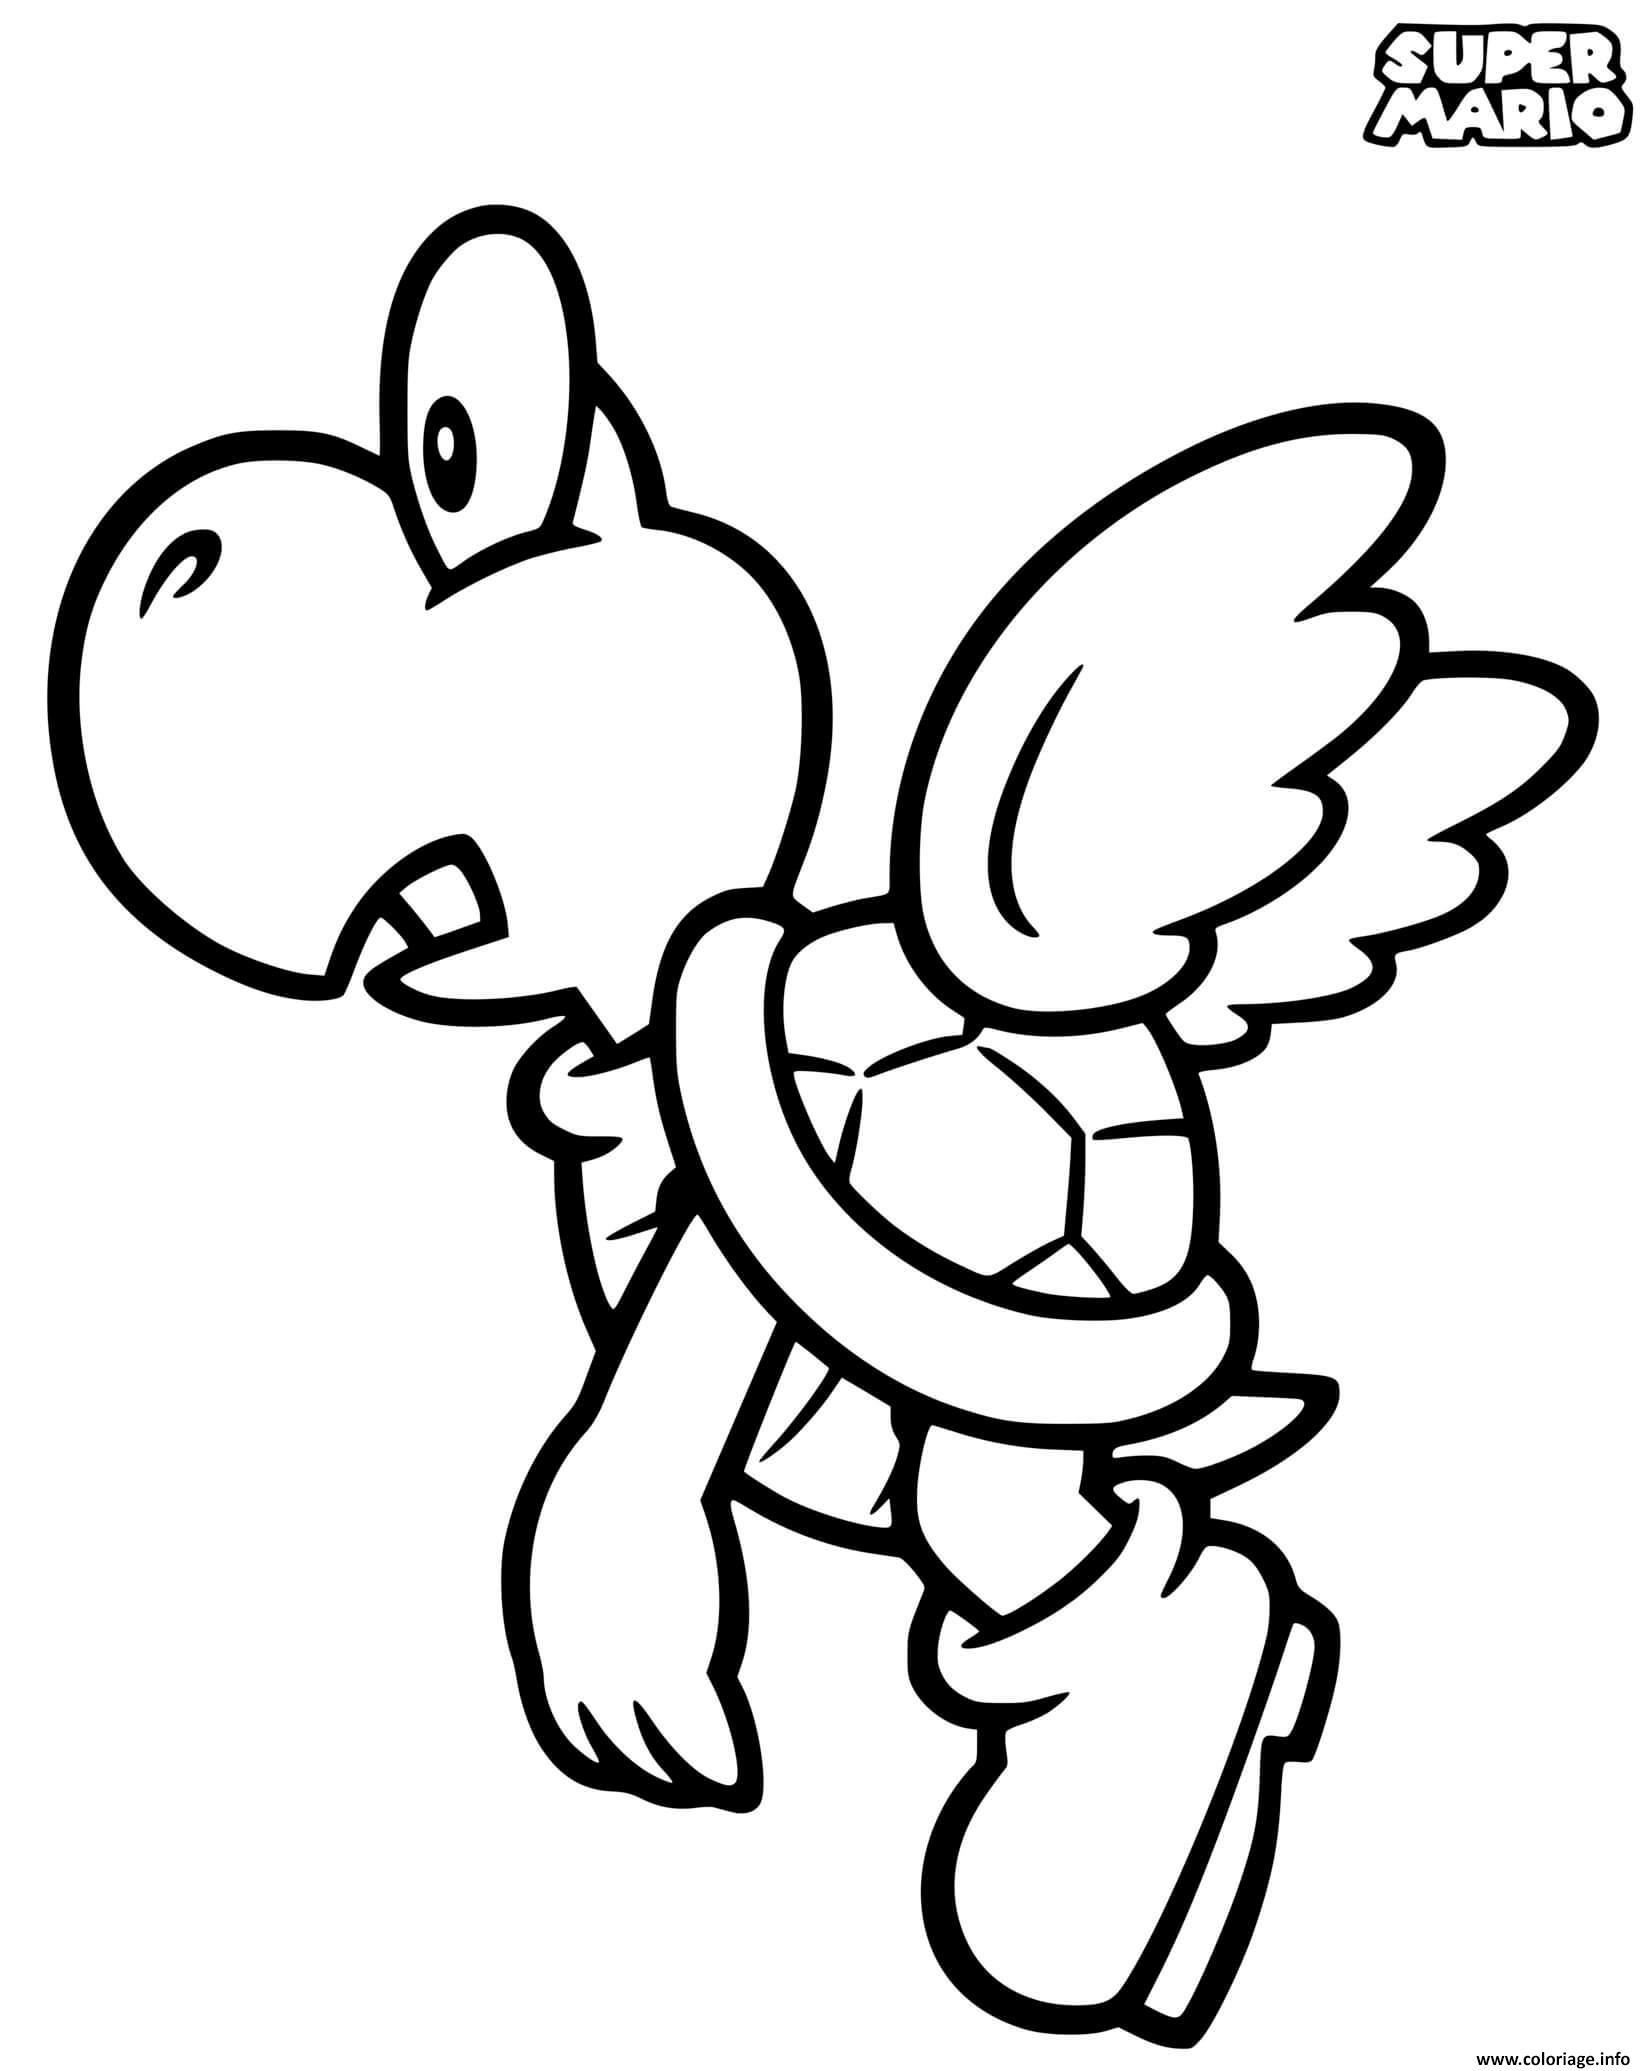 Dessin super mario koopa paratroopa Coloriage Gratuit à Imprimer